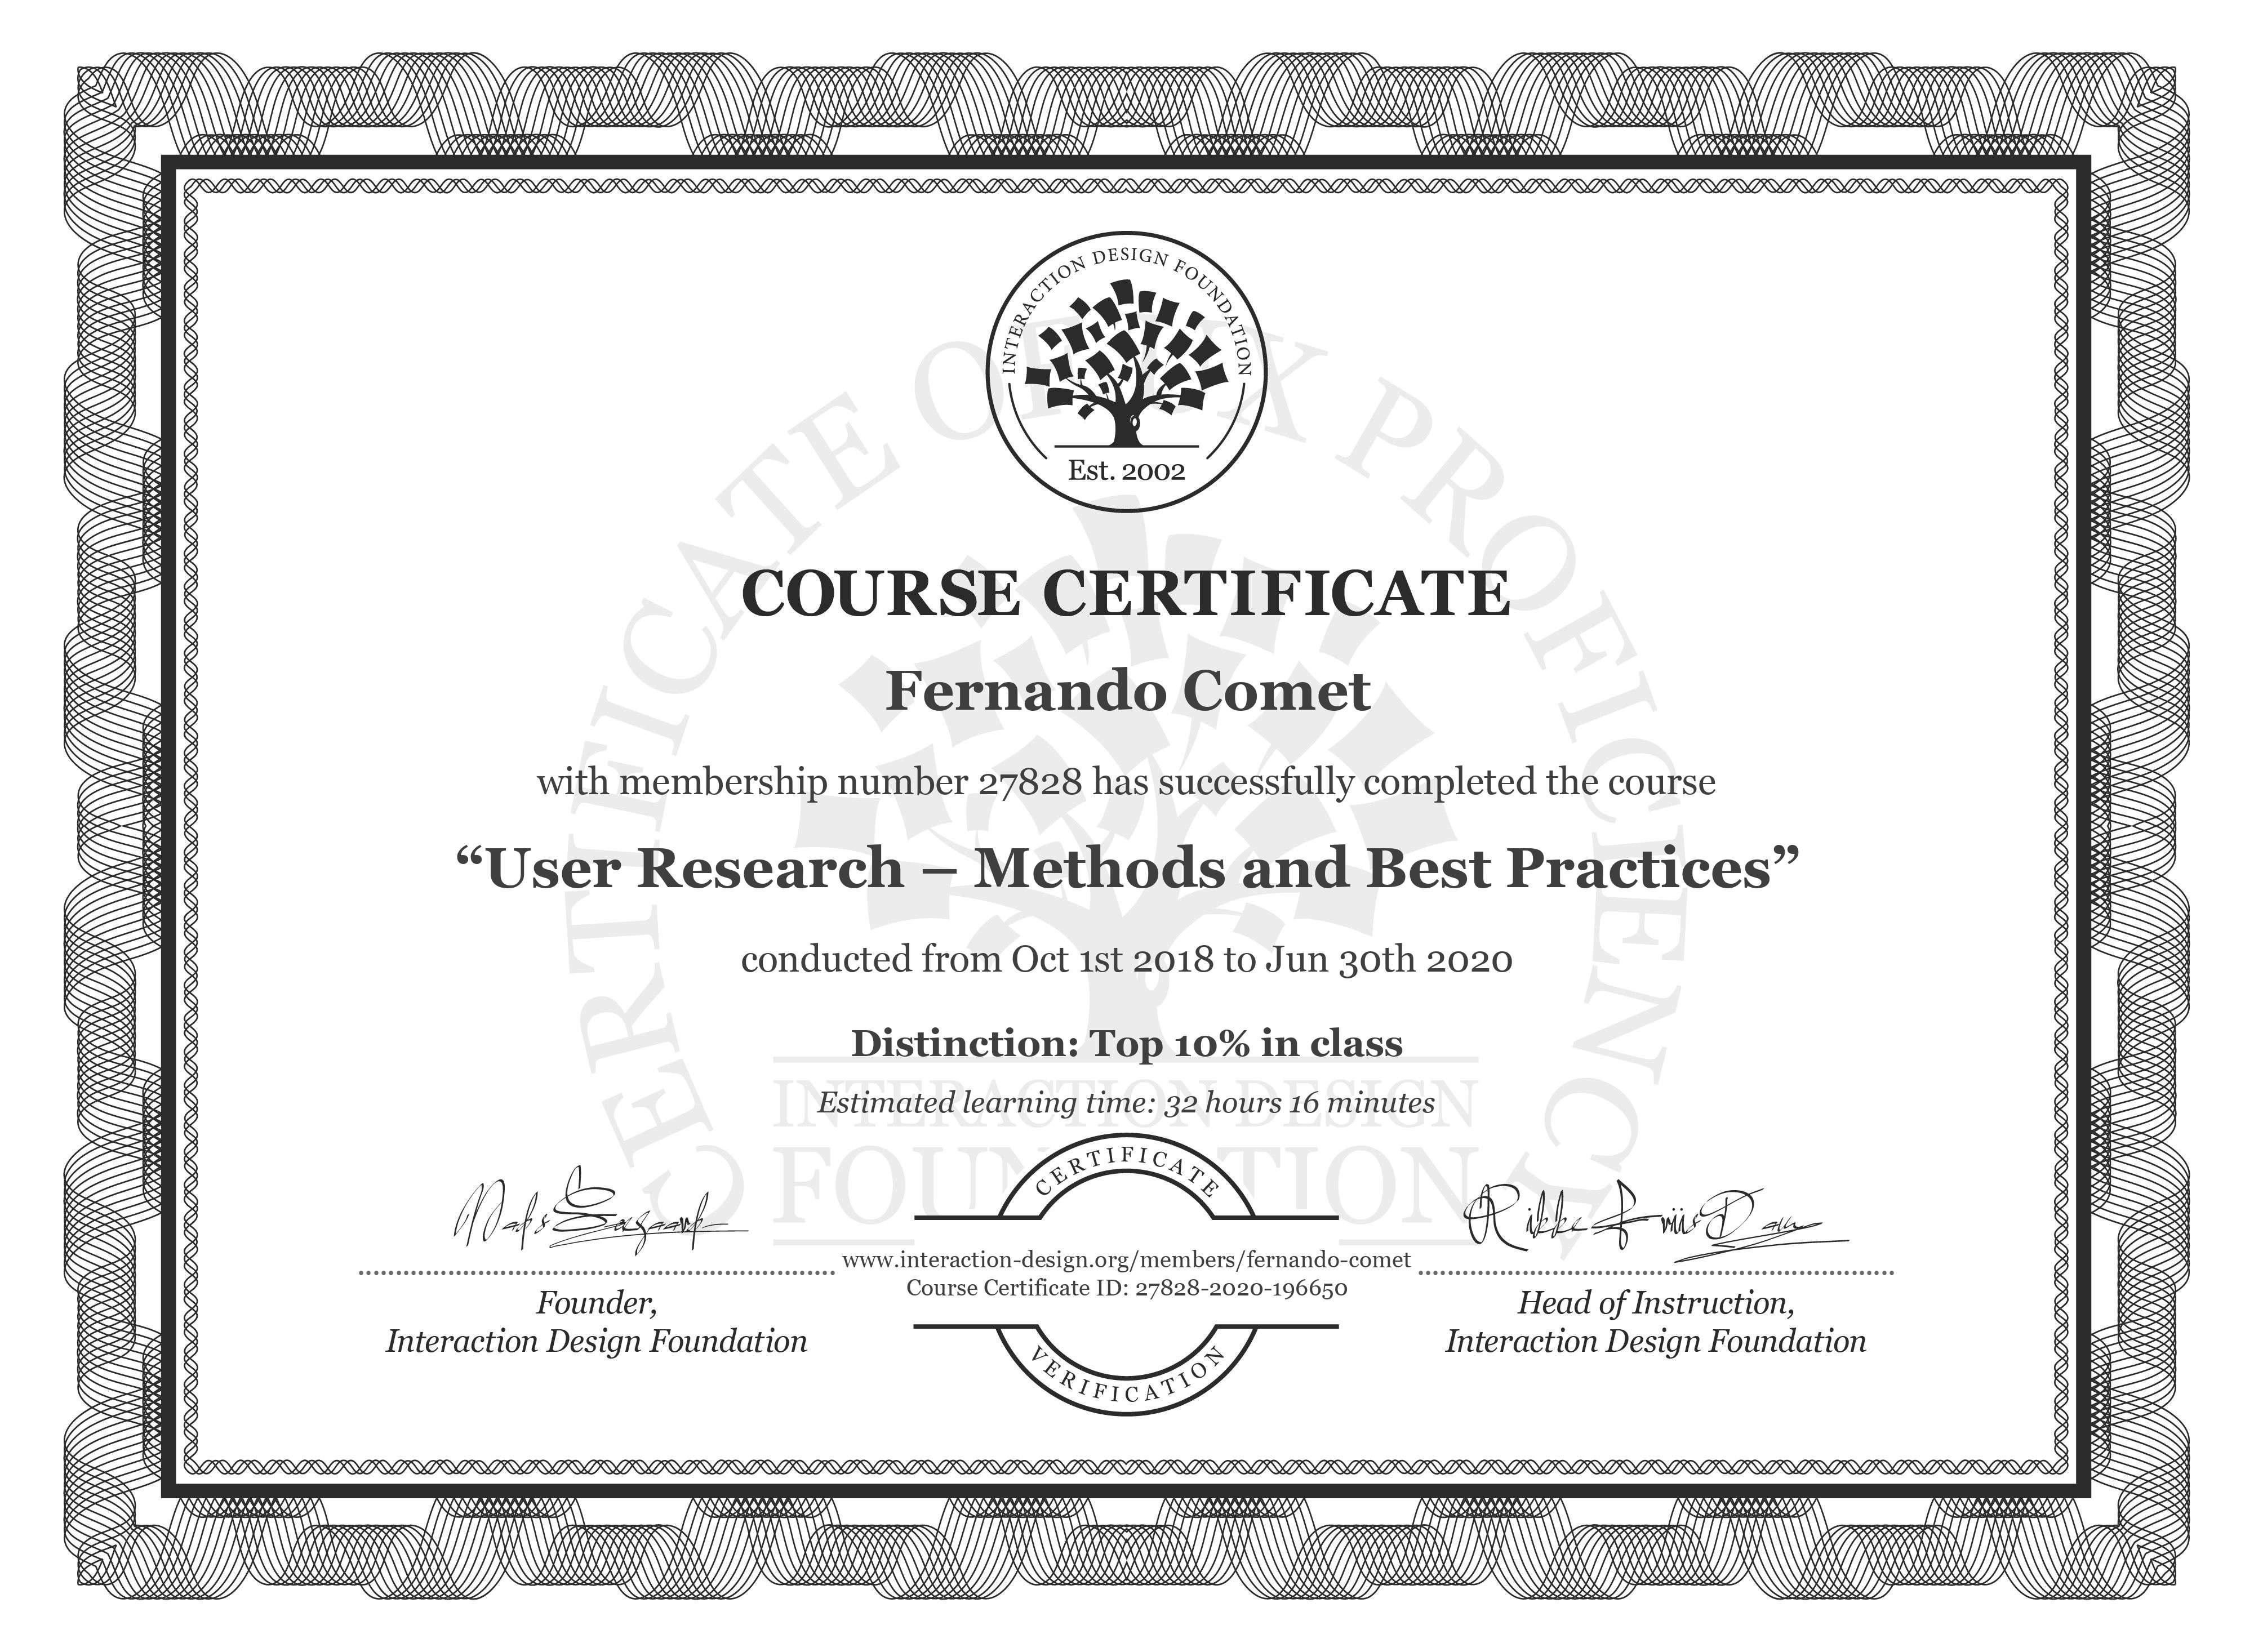 Fernando Comet's Course Certificate: User Research – Methods and Best Practices